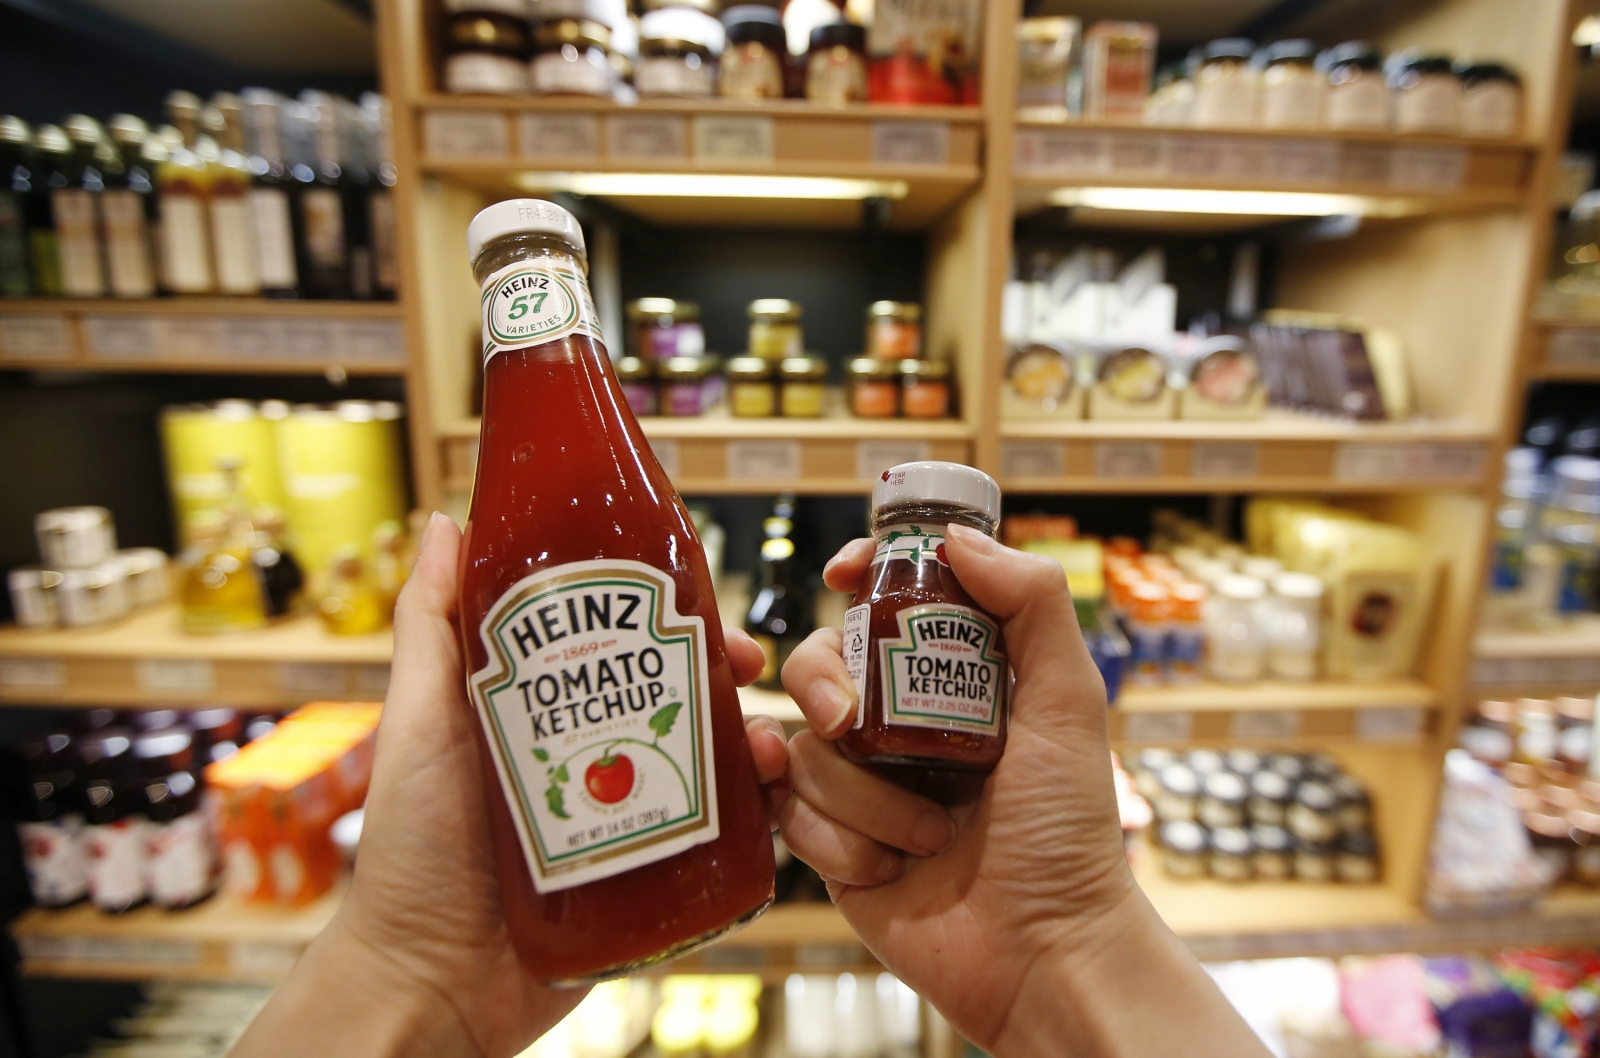 Heinz ketchup bottle